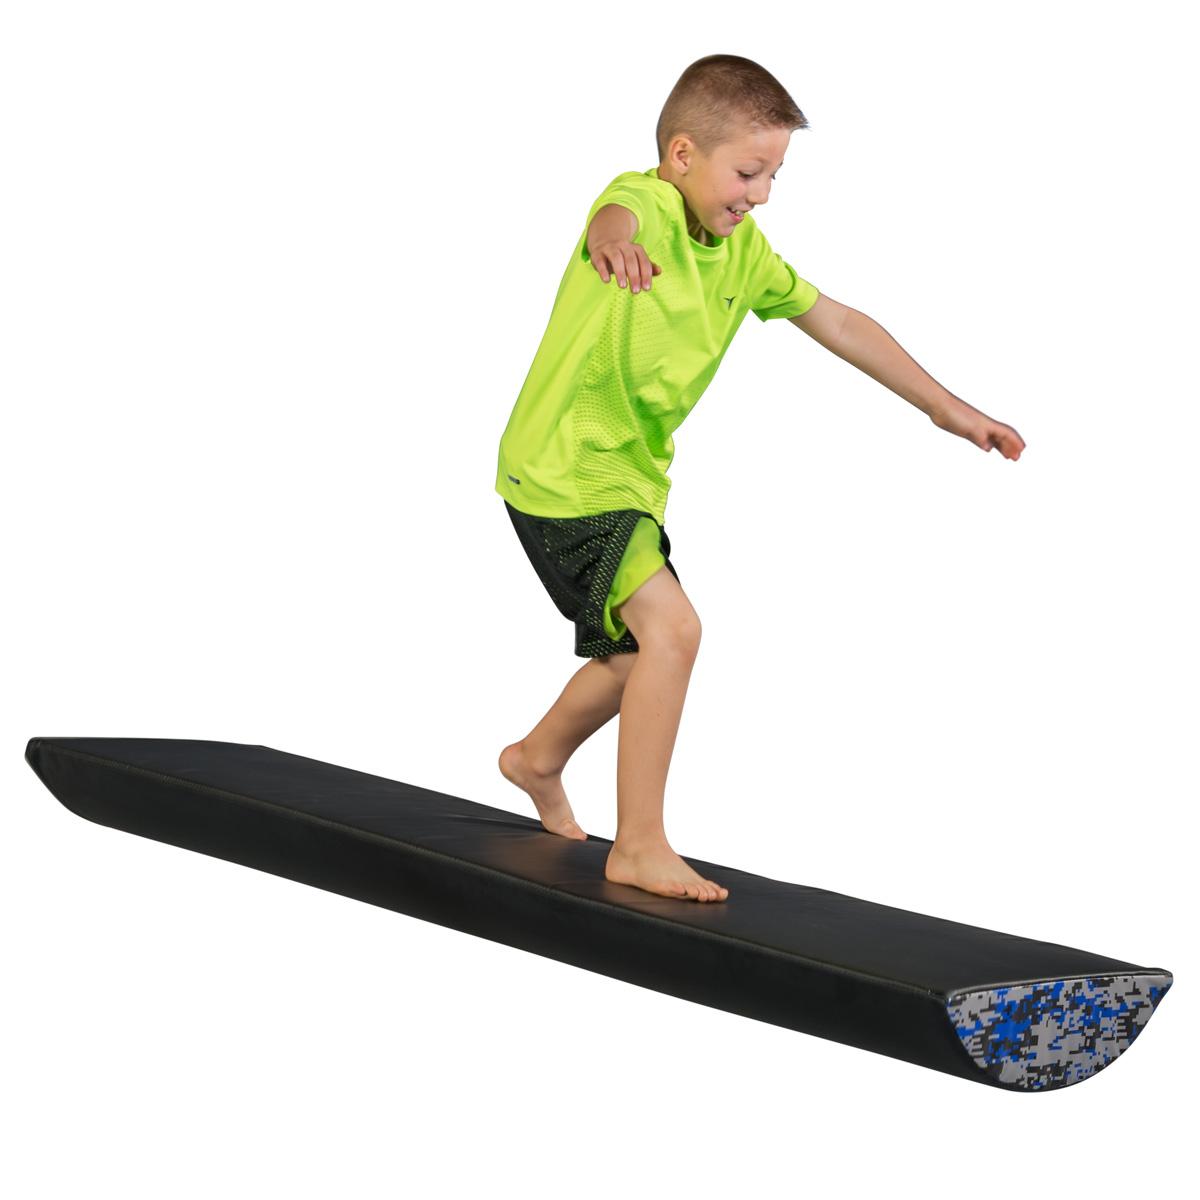 balancing on warrior fitness river log